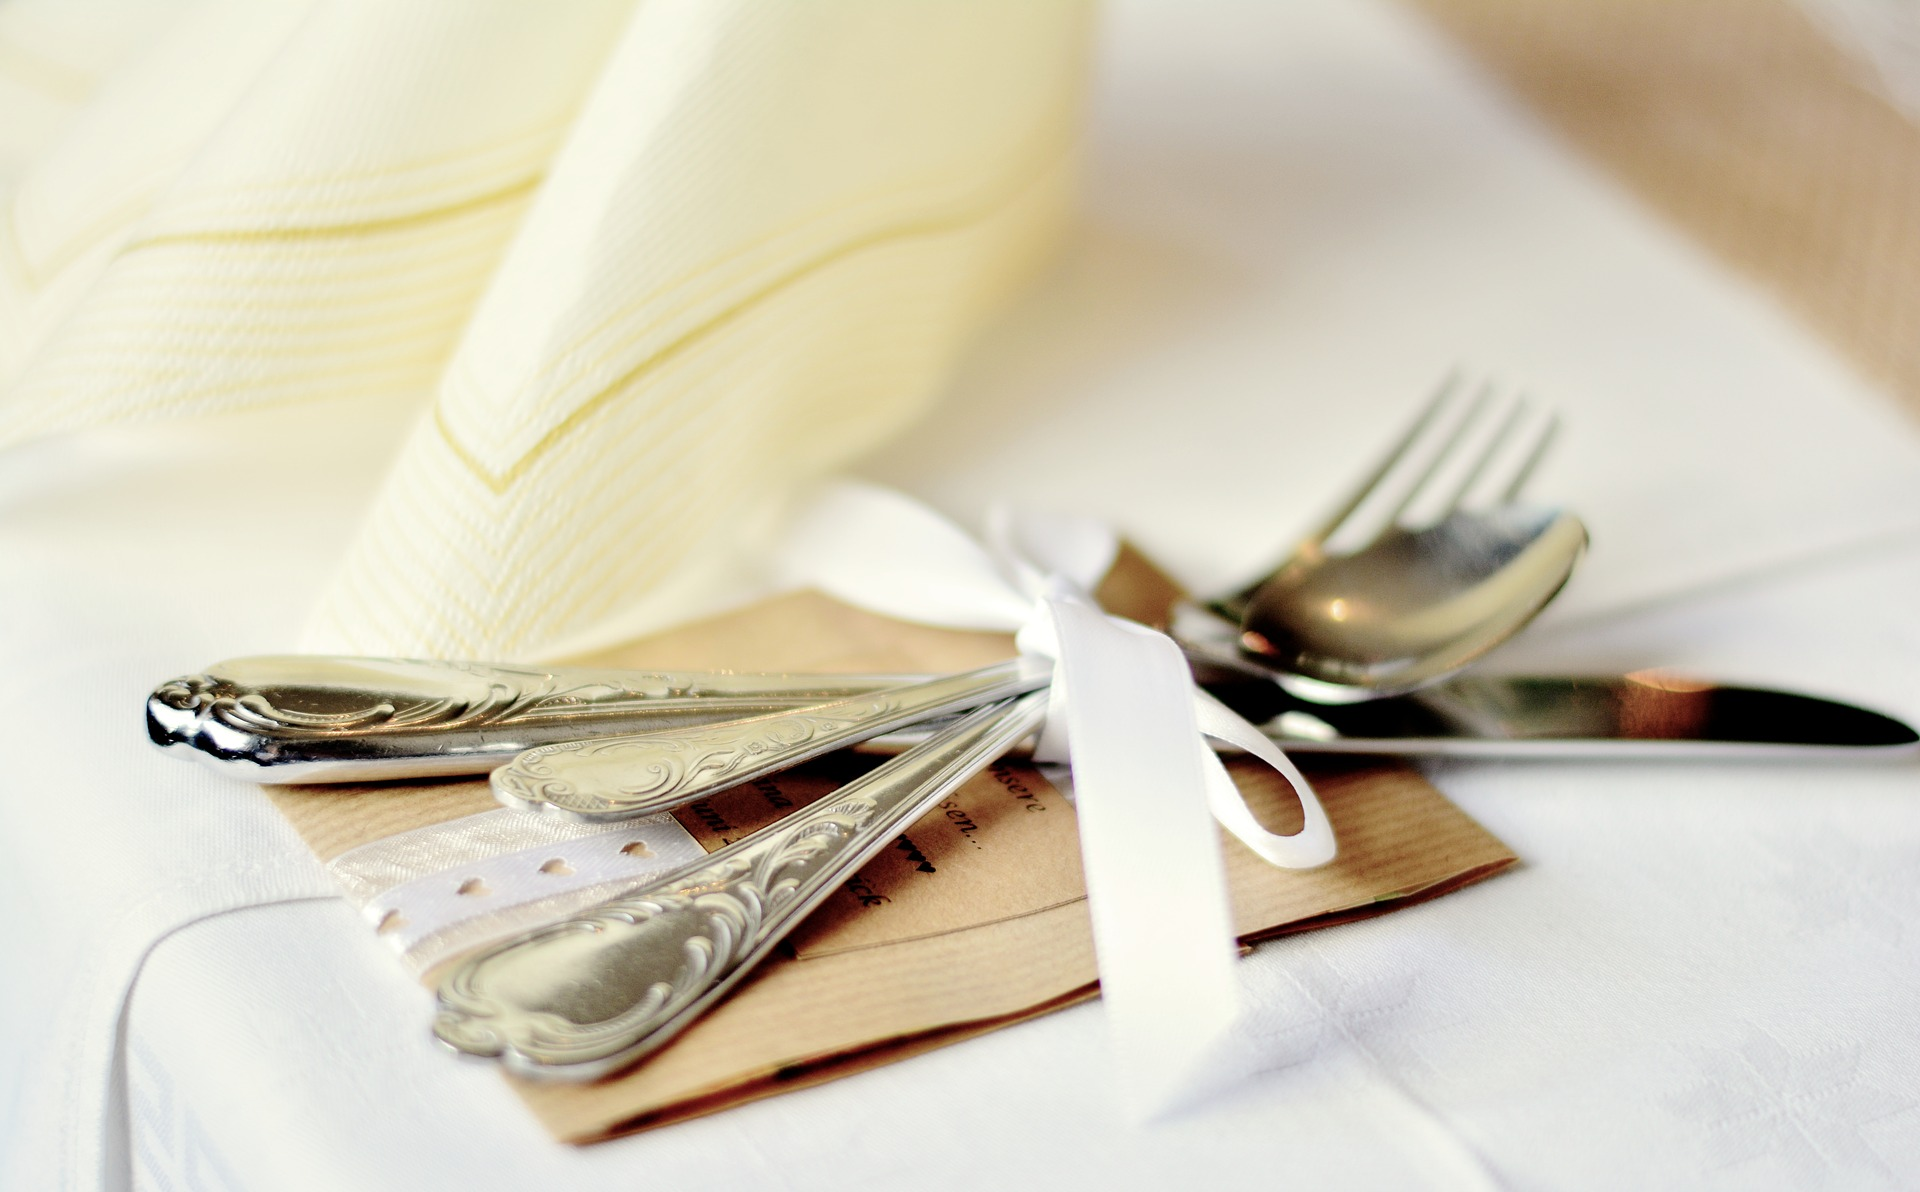 cutlery-2438718_1920.jpg